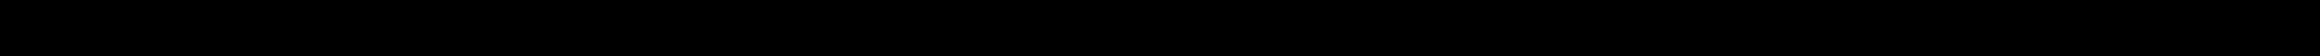 RIDEX 1N4402H, 25184029, 96389188, 96818899, 1109 38 Oljefilter